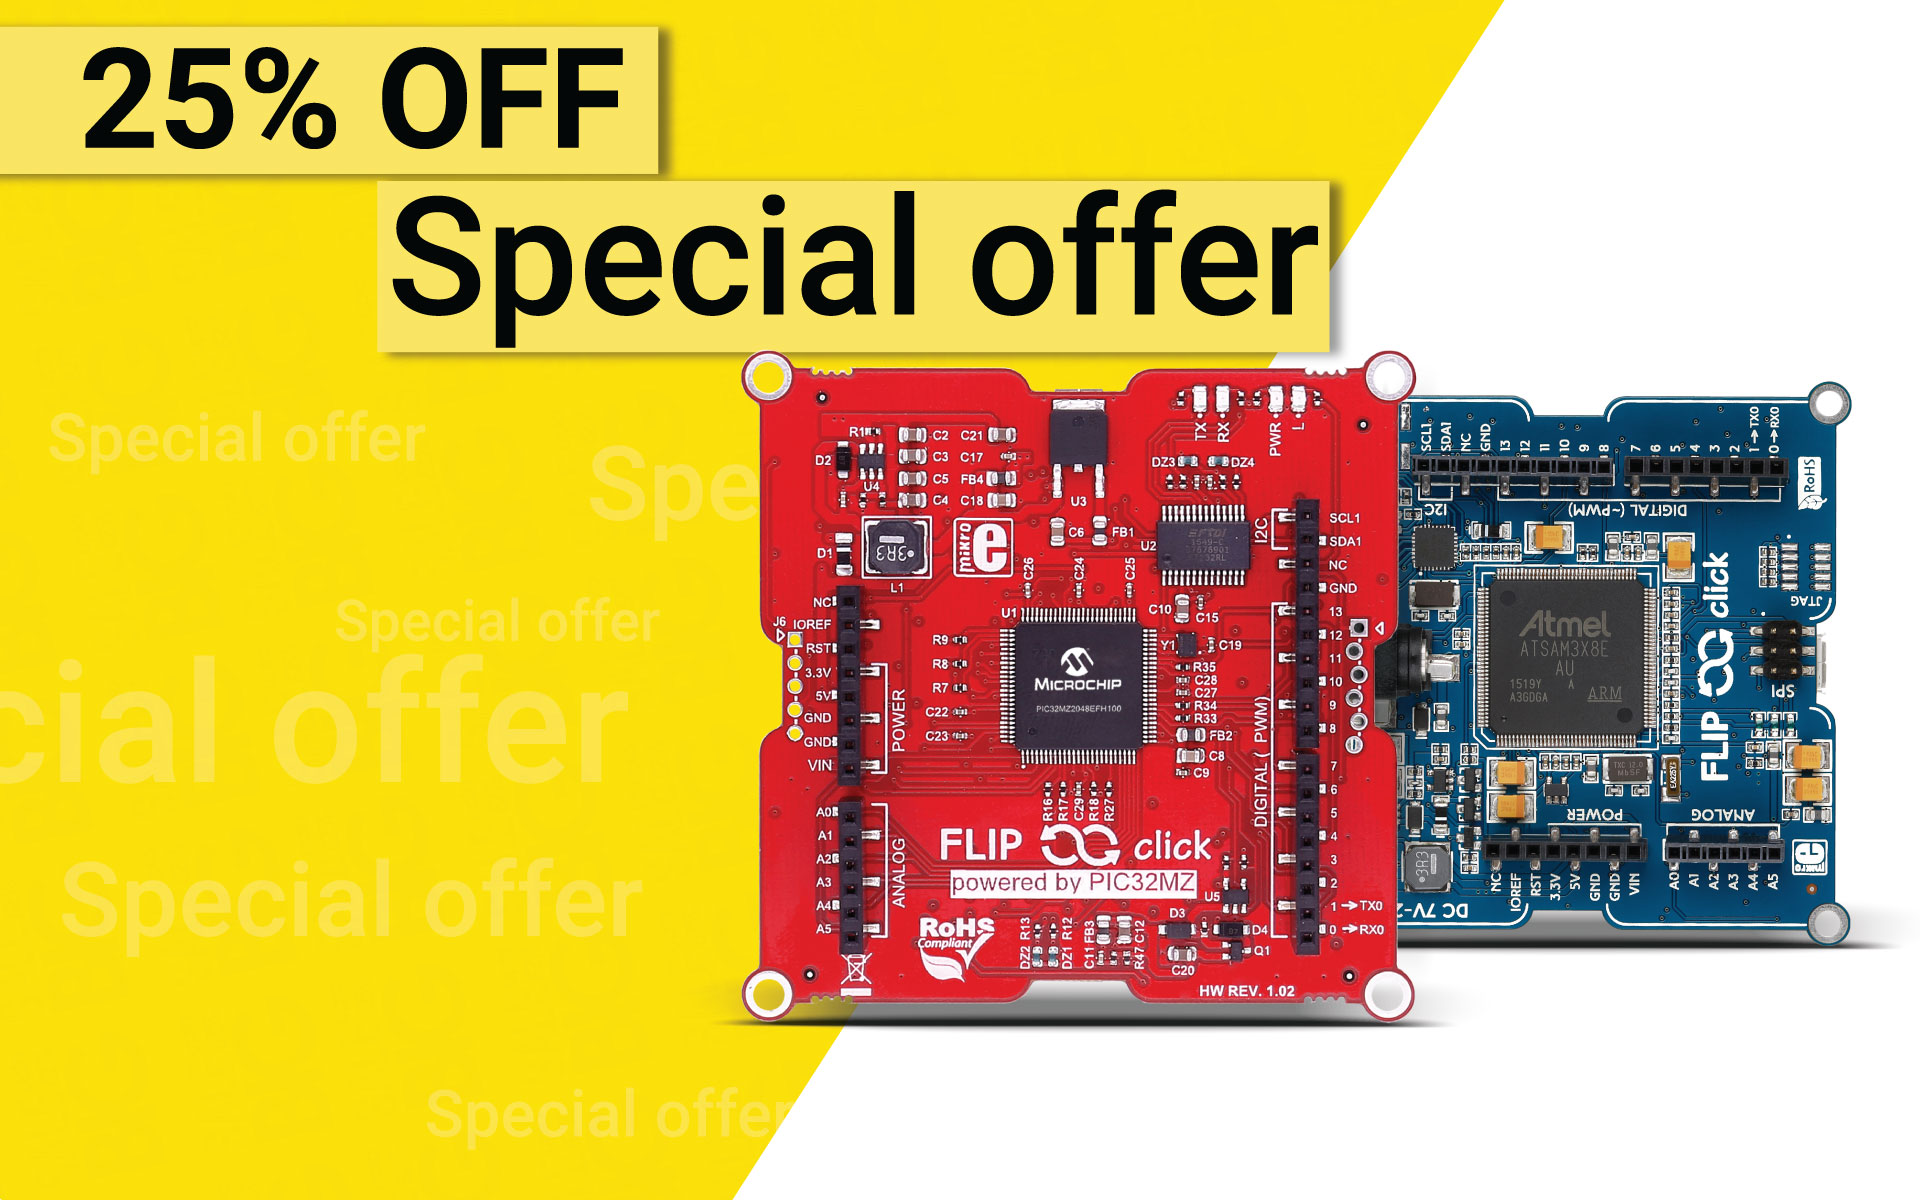 Flip&Click special offer